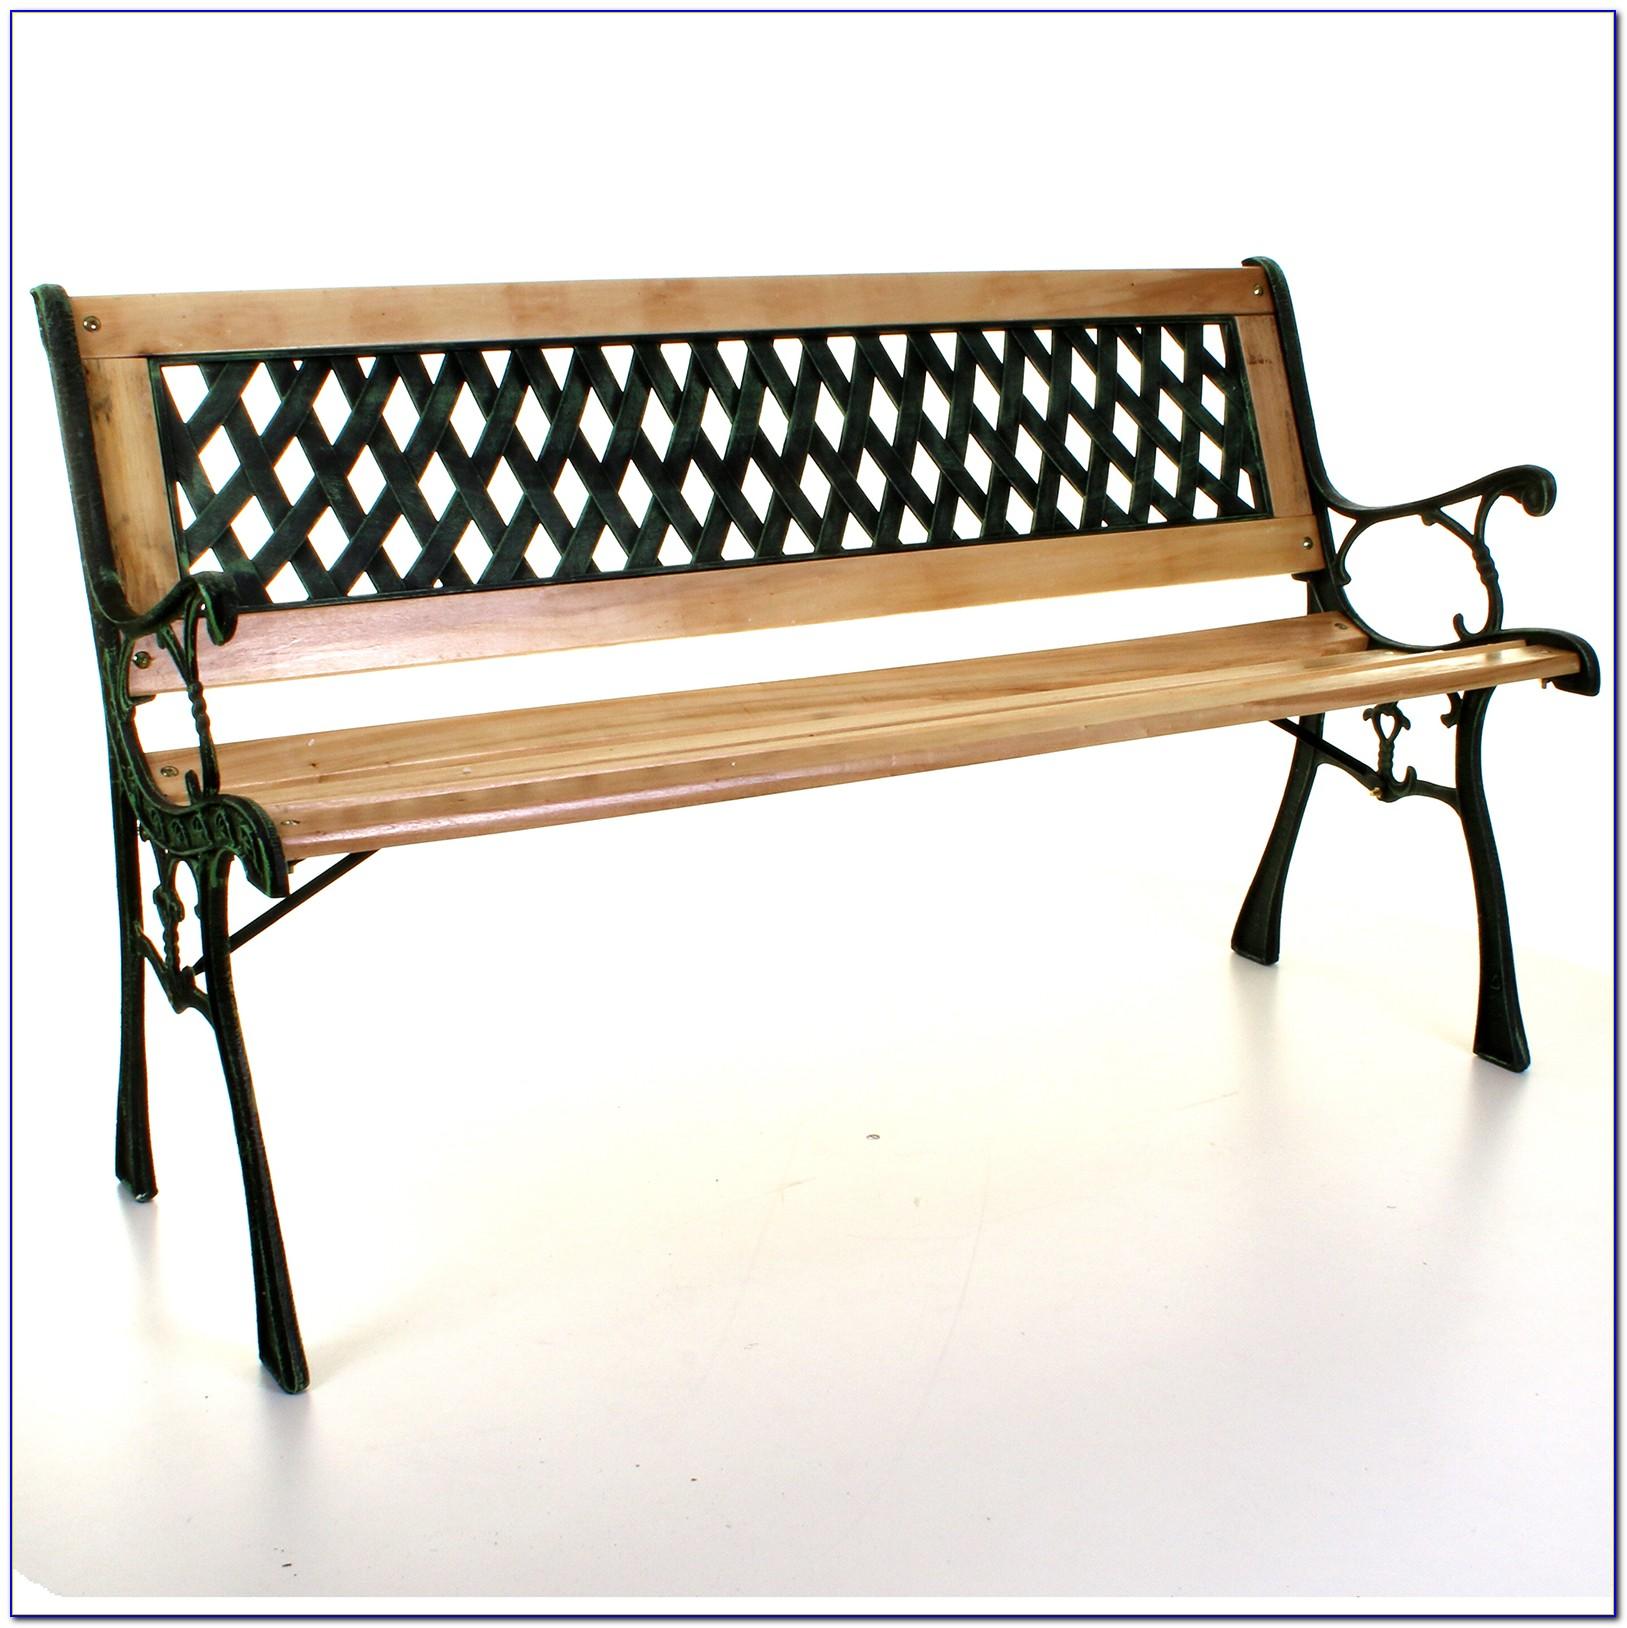 Antique Cast Iron Bench Legs